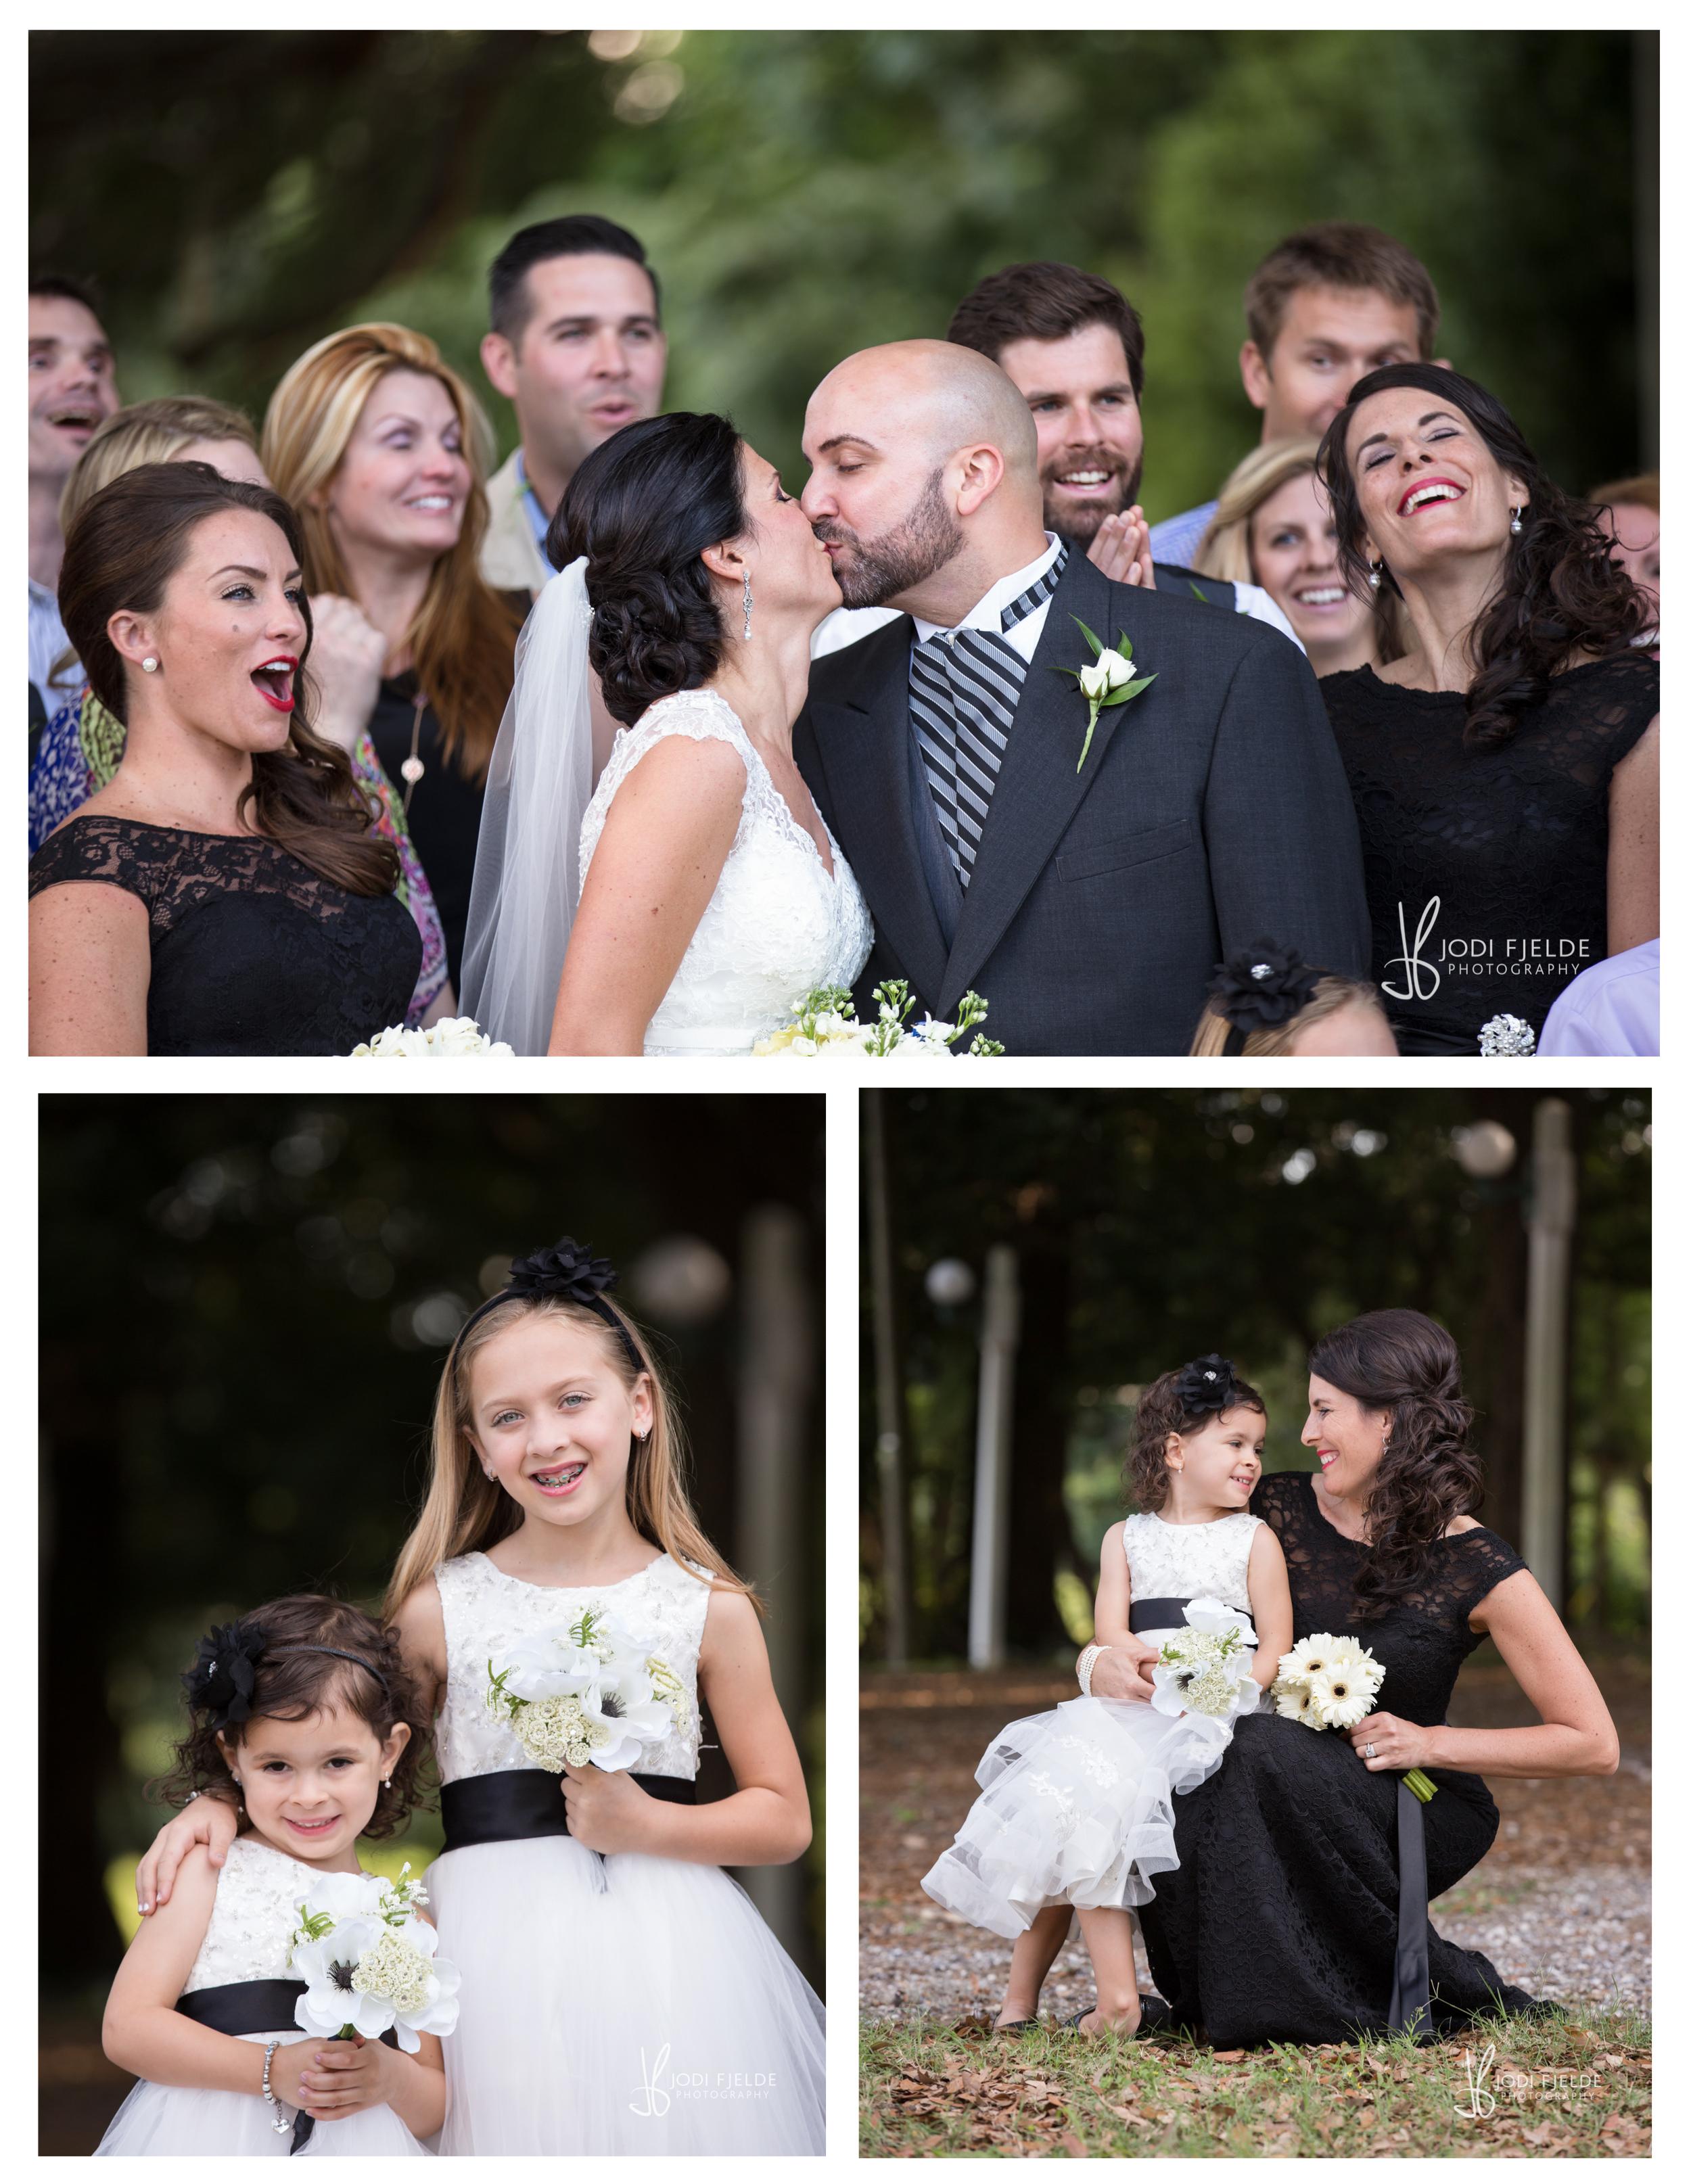 Highland_Manor_Apopka_Florida_wedding_Jackie_&_Tim_photography_jodi_Fjelde_photography-18.jpg